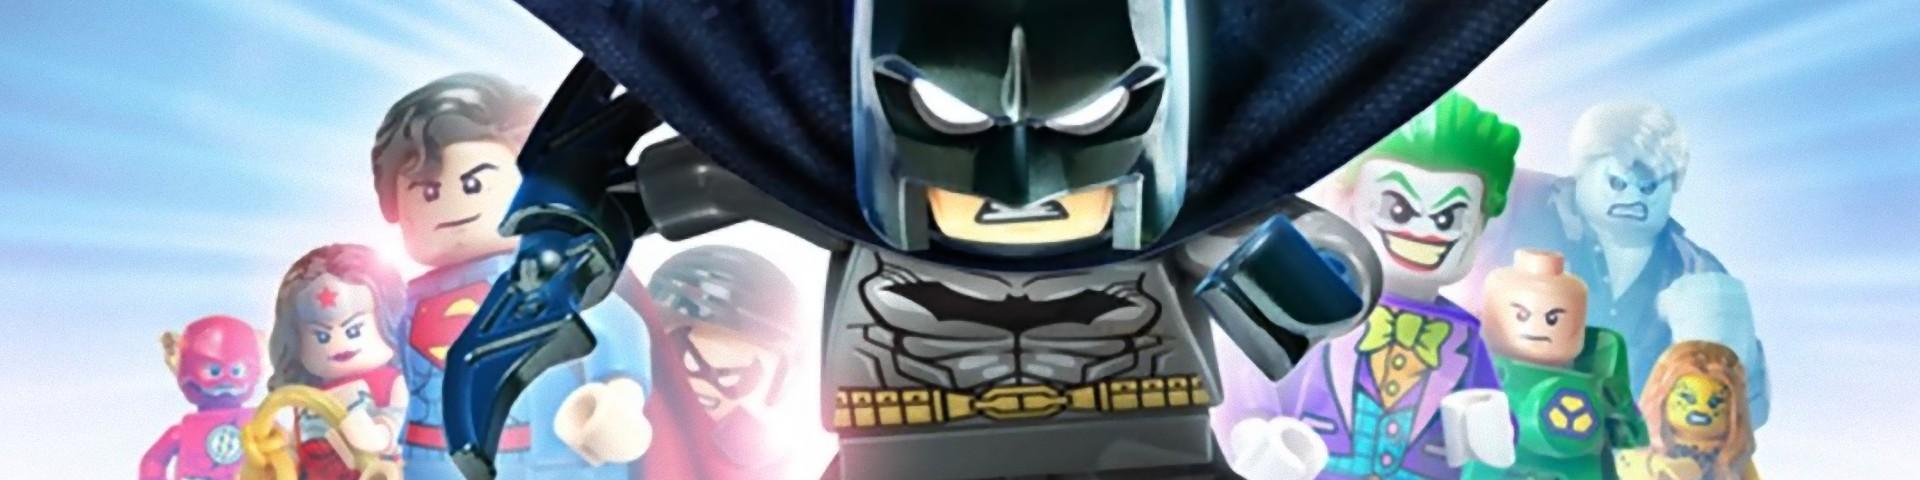 videogame lego batman